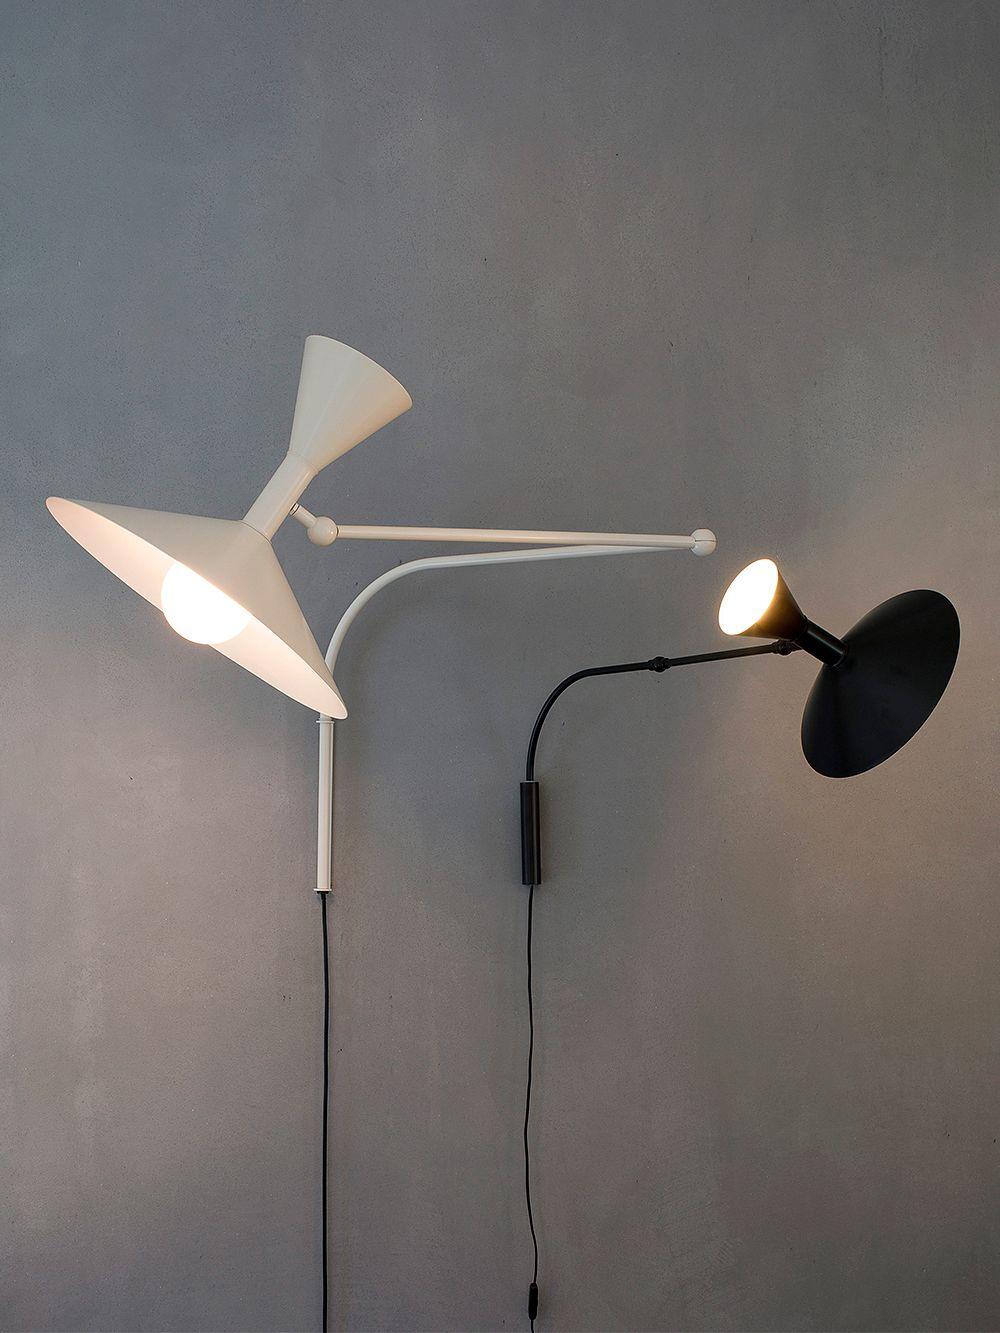 Nemo Lighting: Lampe de Marseille